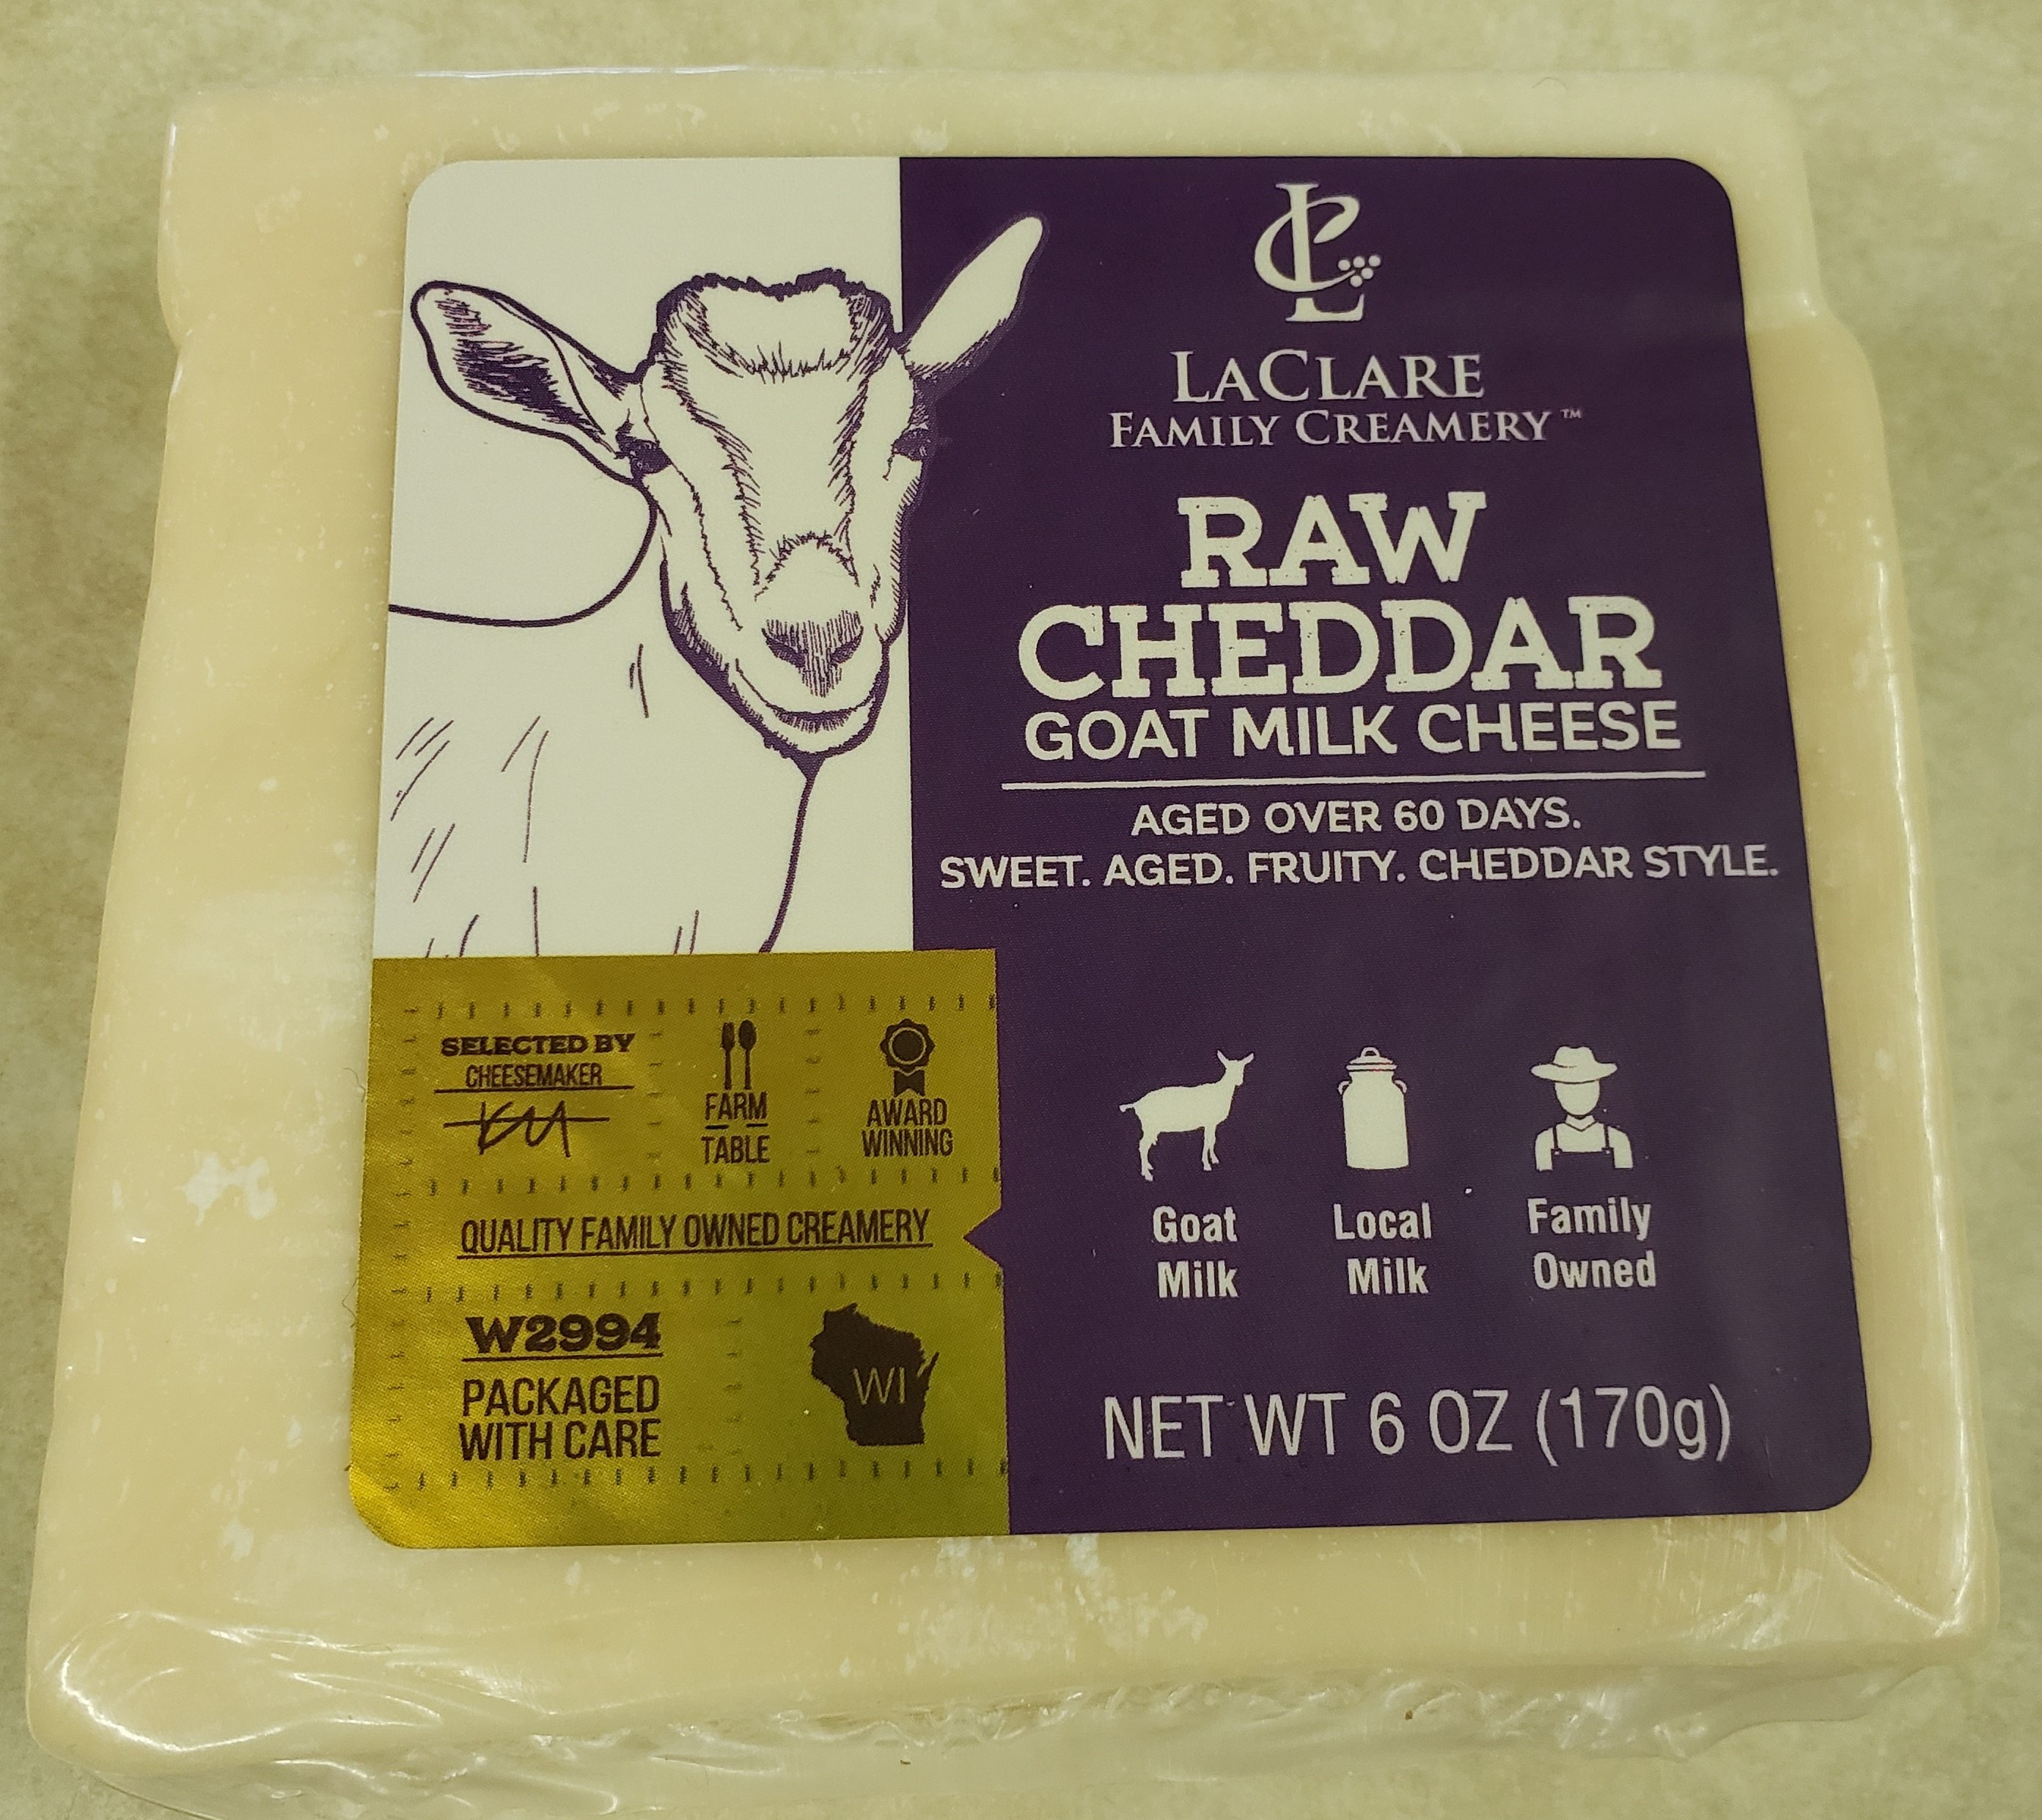 Laclare Family Creamery Raw Milk Cheddar Goat Cheese